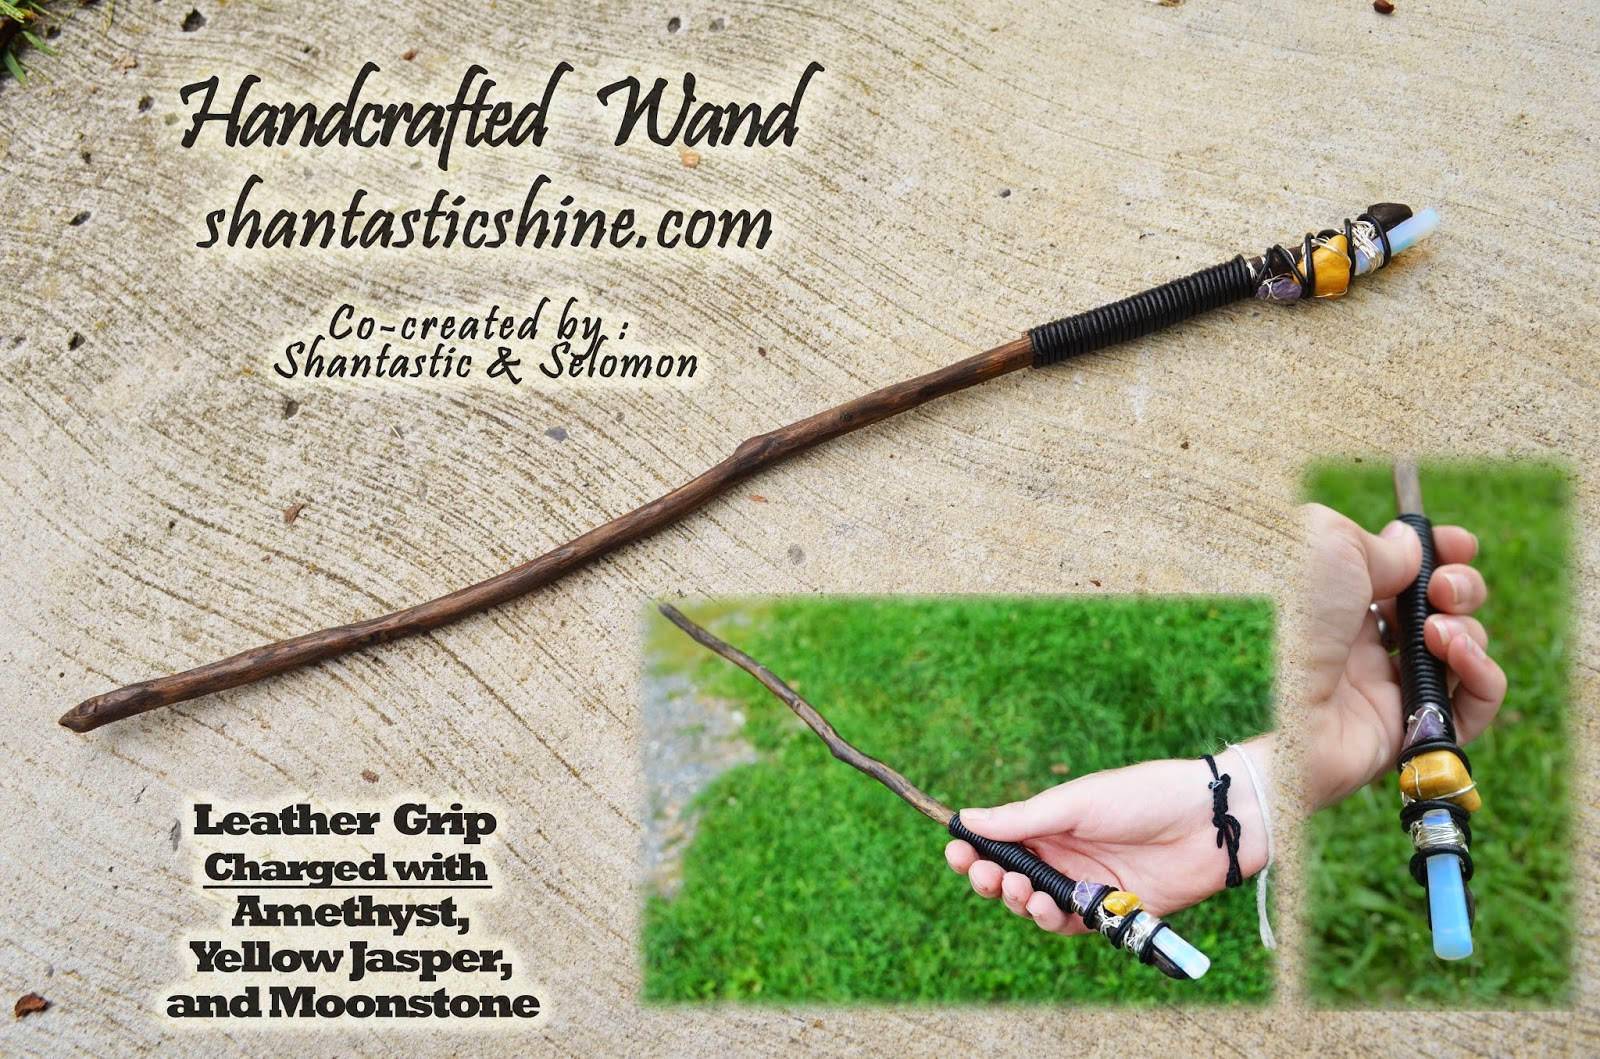 http://www.shantasticshine.com/#!product/prd12/2746863771/amethyst-%2C-jasper%2C-and-moonstone-handcrafted-wand